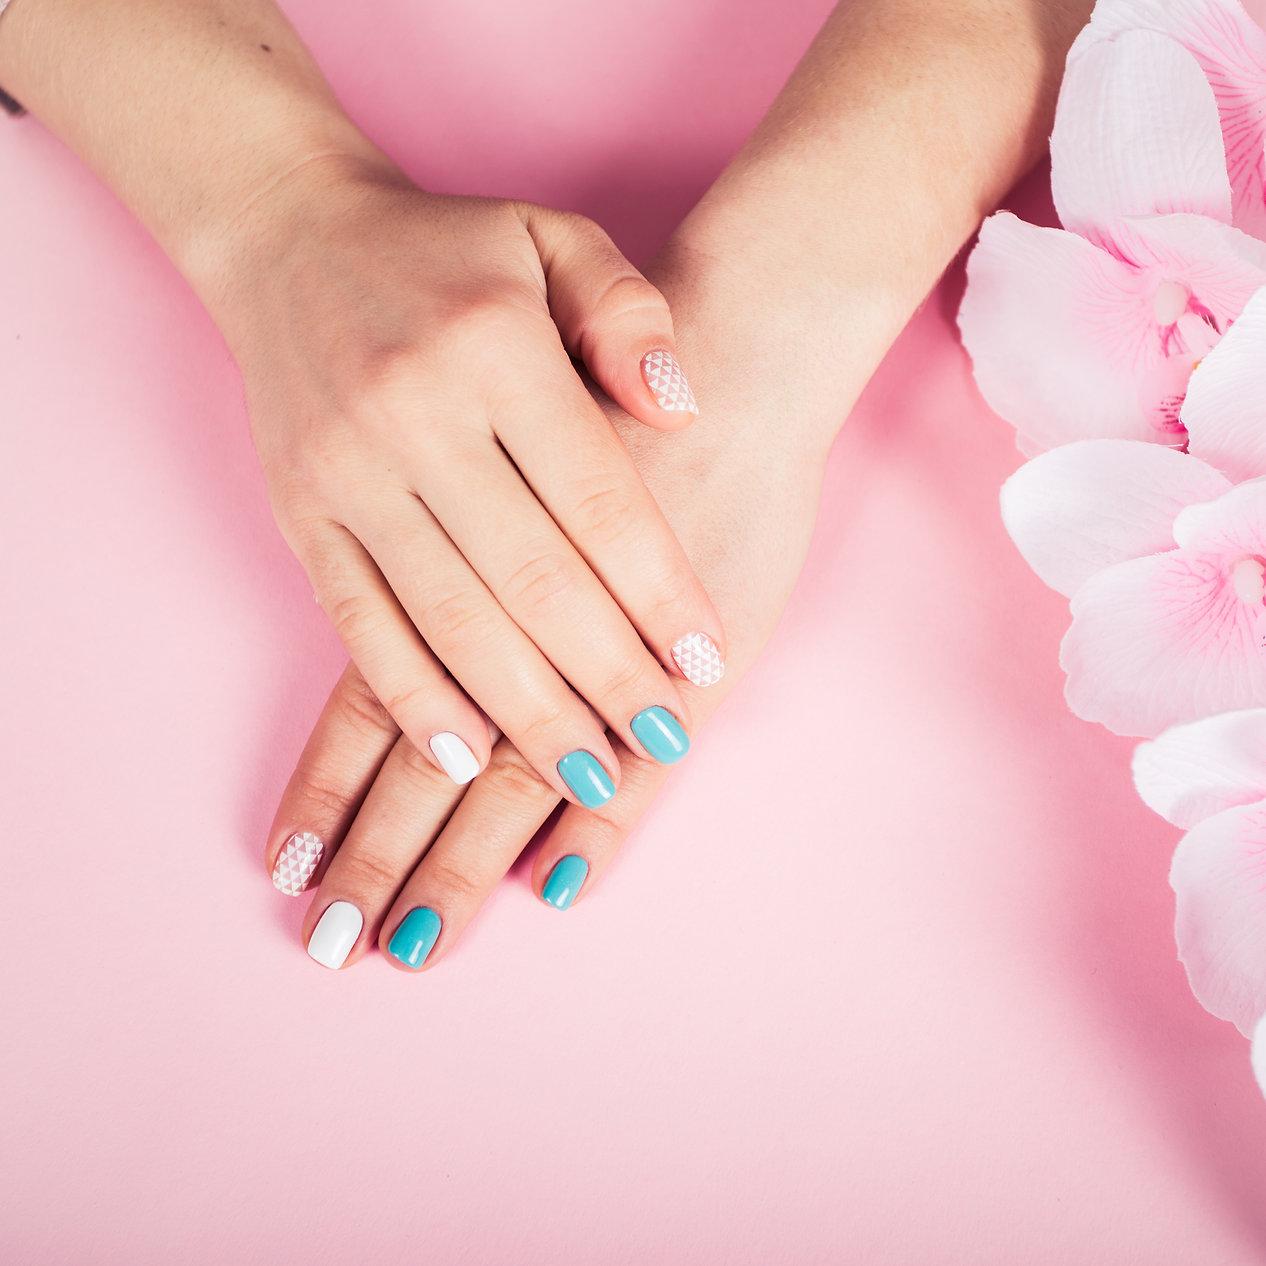 beautiful-manicure-gel-polish-coating-in